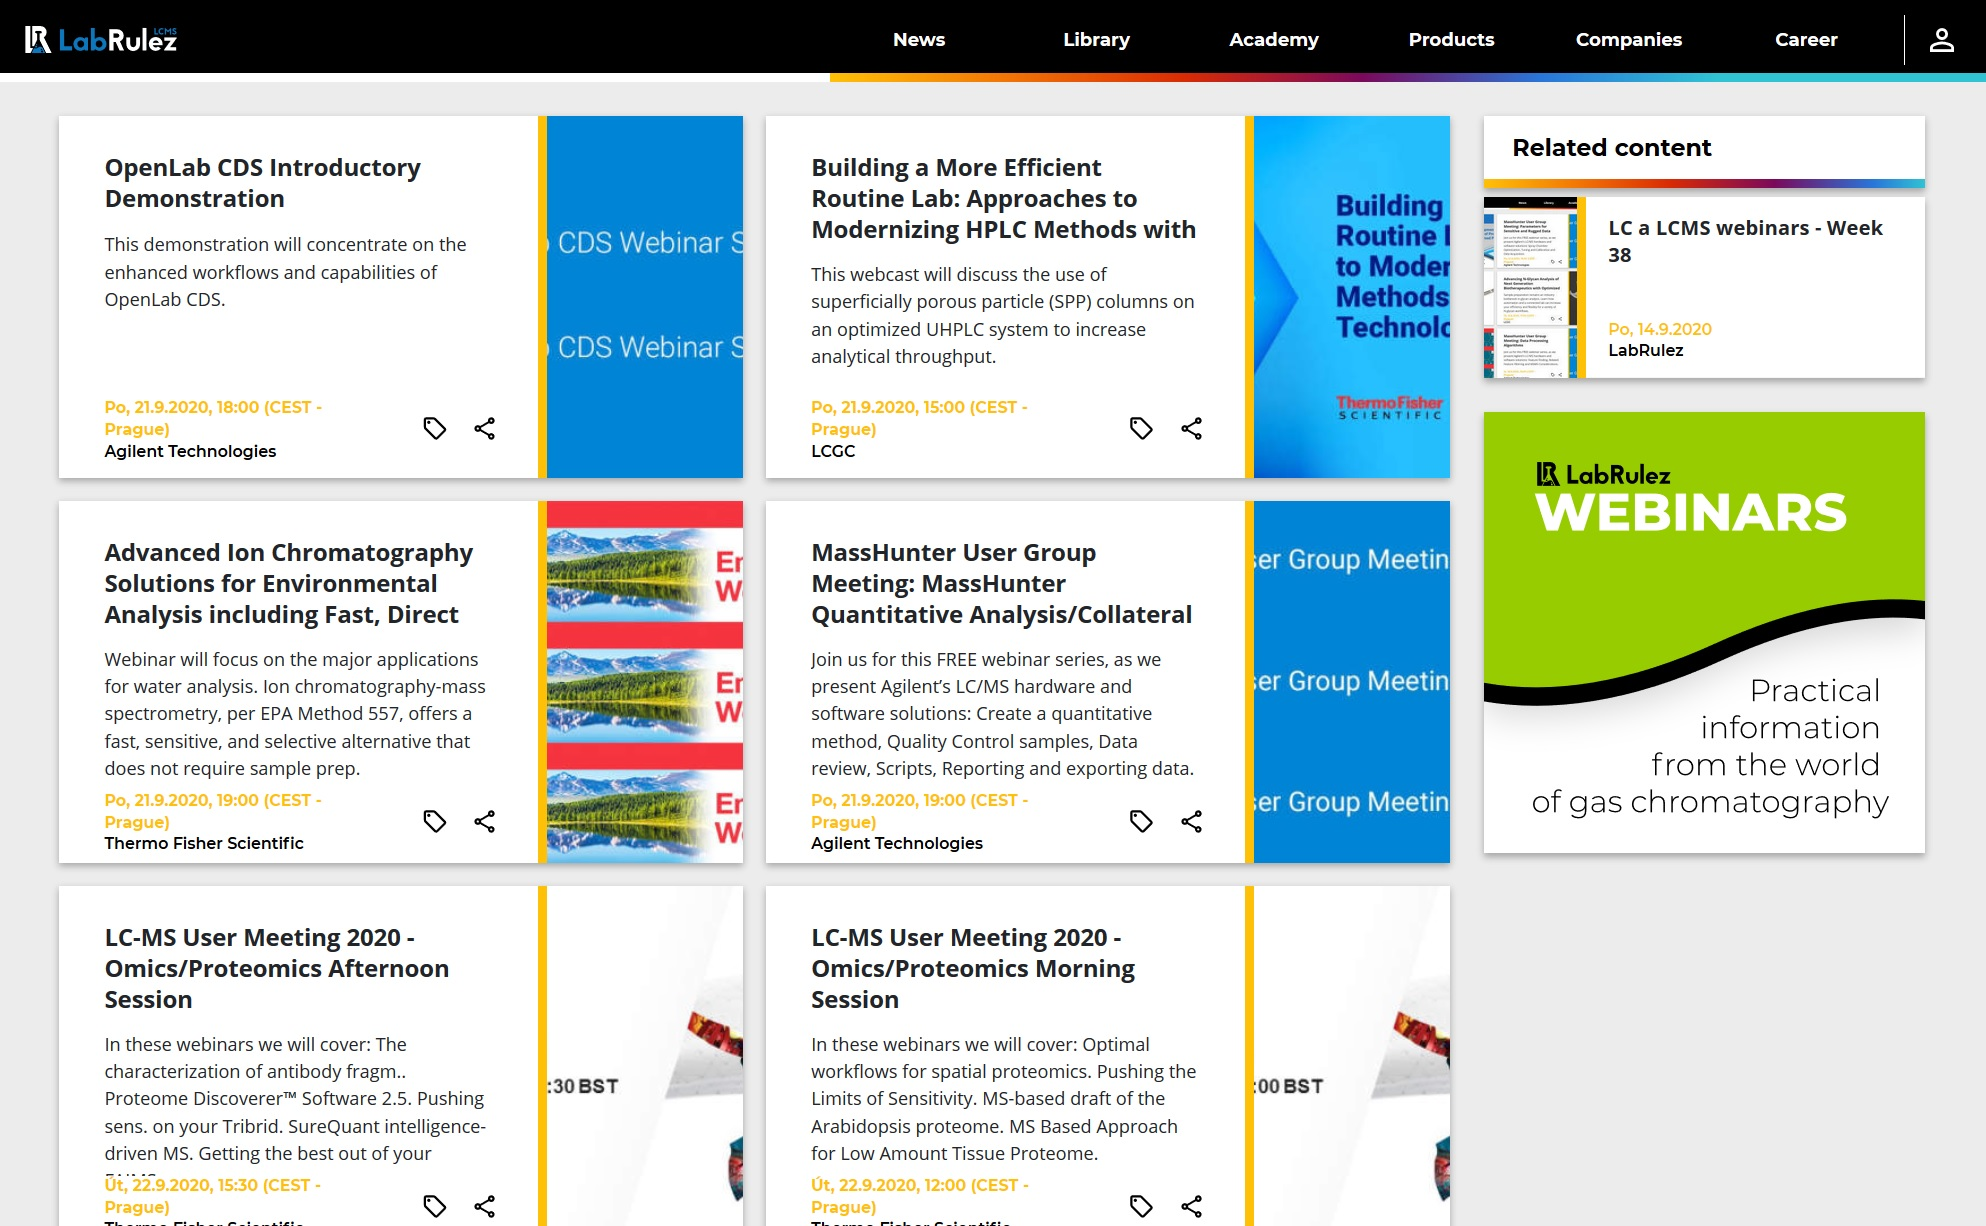 LabRulez: LC a LCMS webinars - Week 39